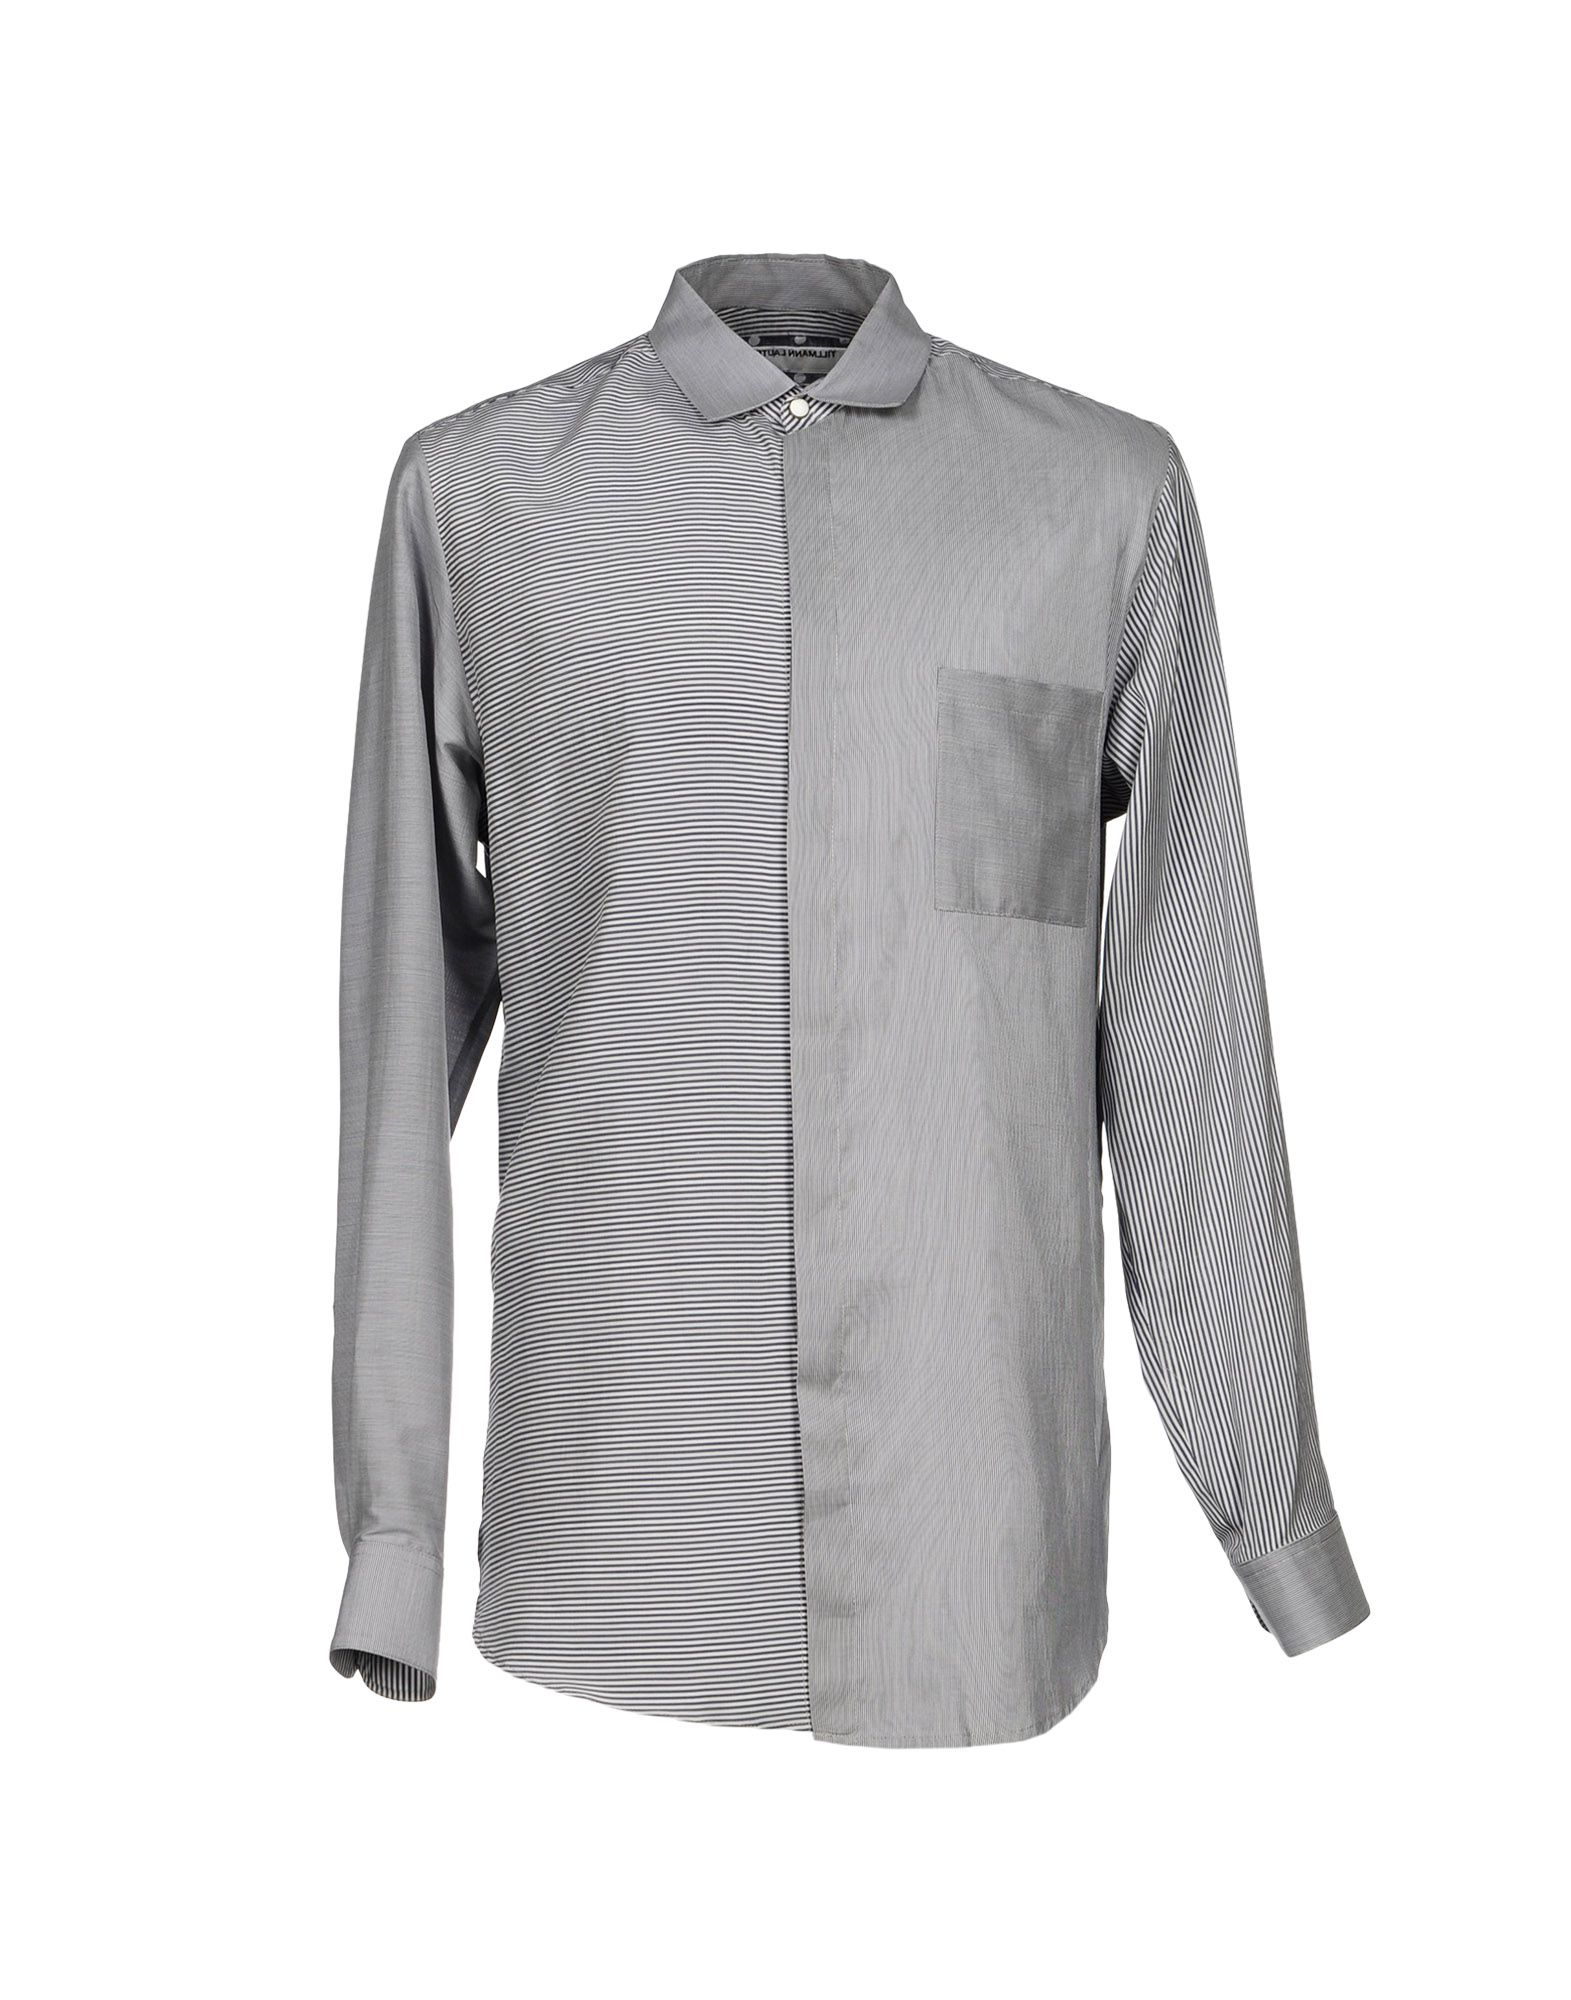 TILLMANN LAUTERBACH Striped Shirt in Blue